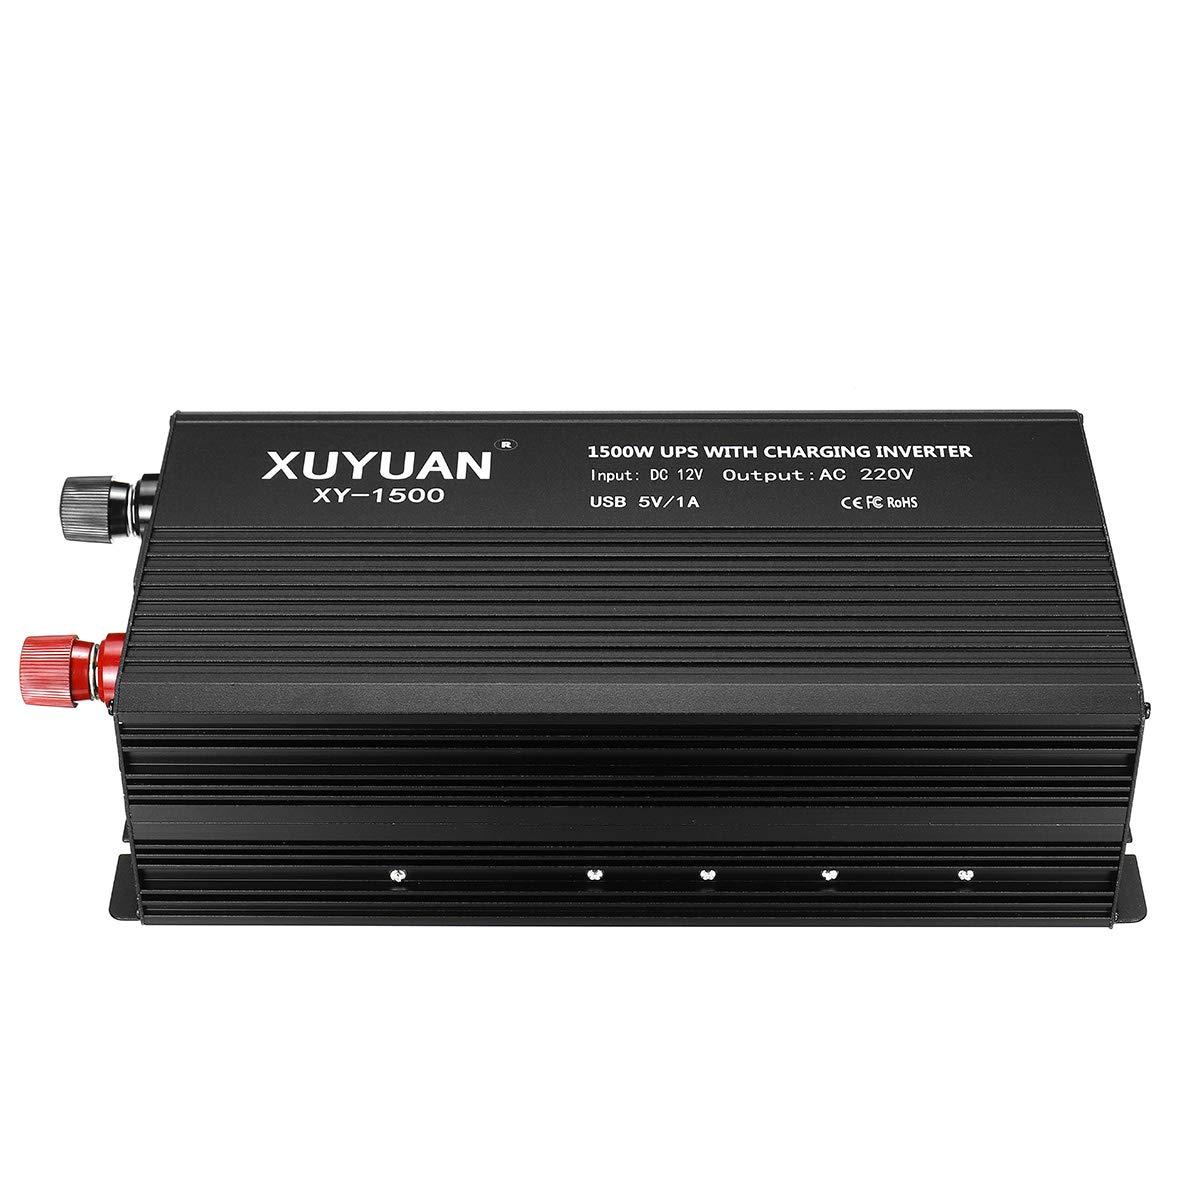 Award 1500W DC 12V to Store AC 220V UPS Sine Power Modified Inverter Wave LC